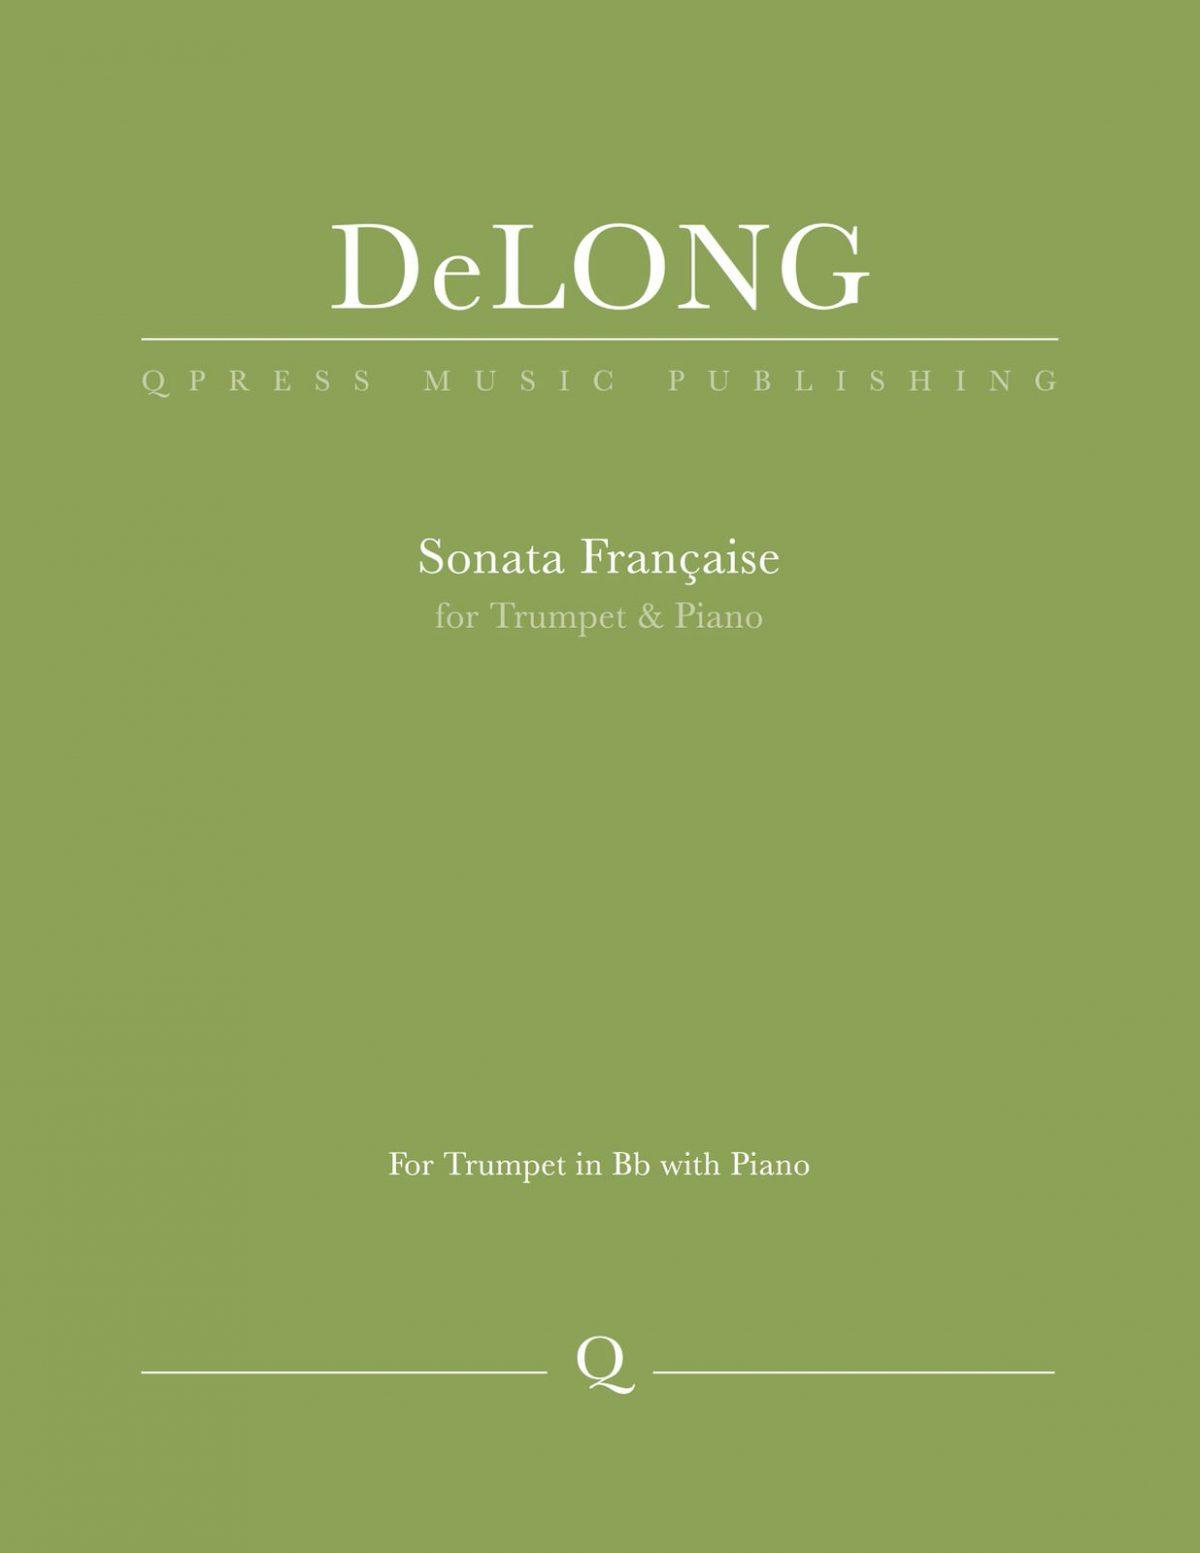 DeLong, Sonata Française-p01